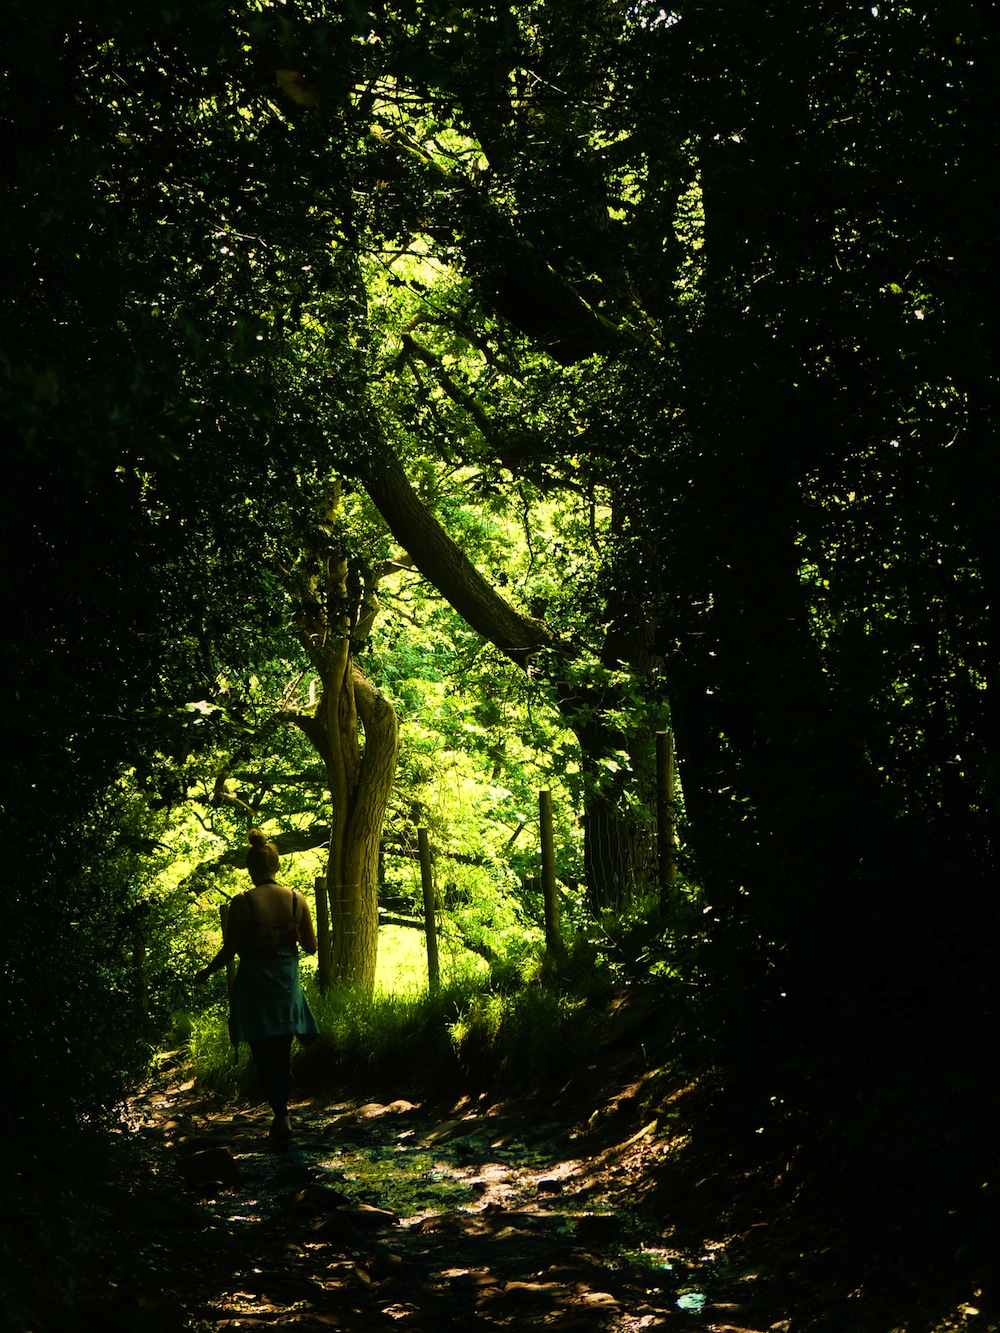 eleanor bennett photo of nature path